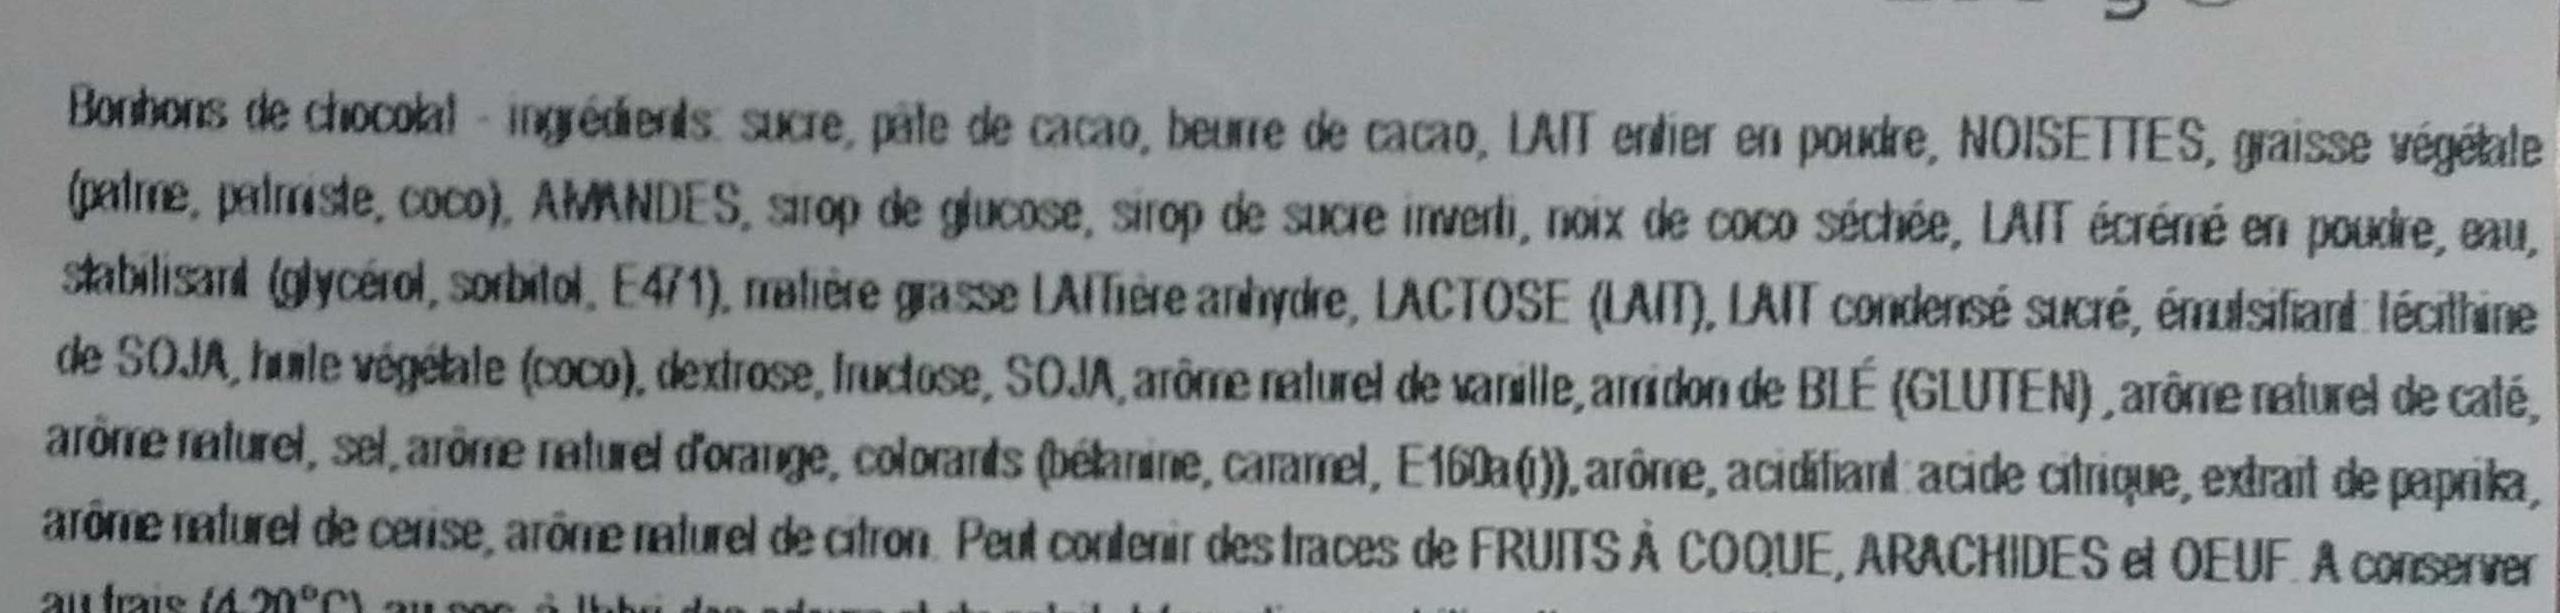 Bonbons de chocolat - Ingredients - fr